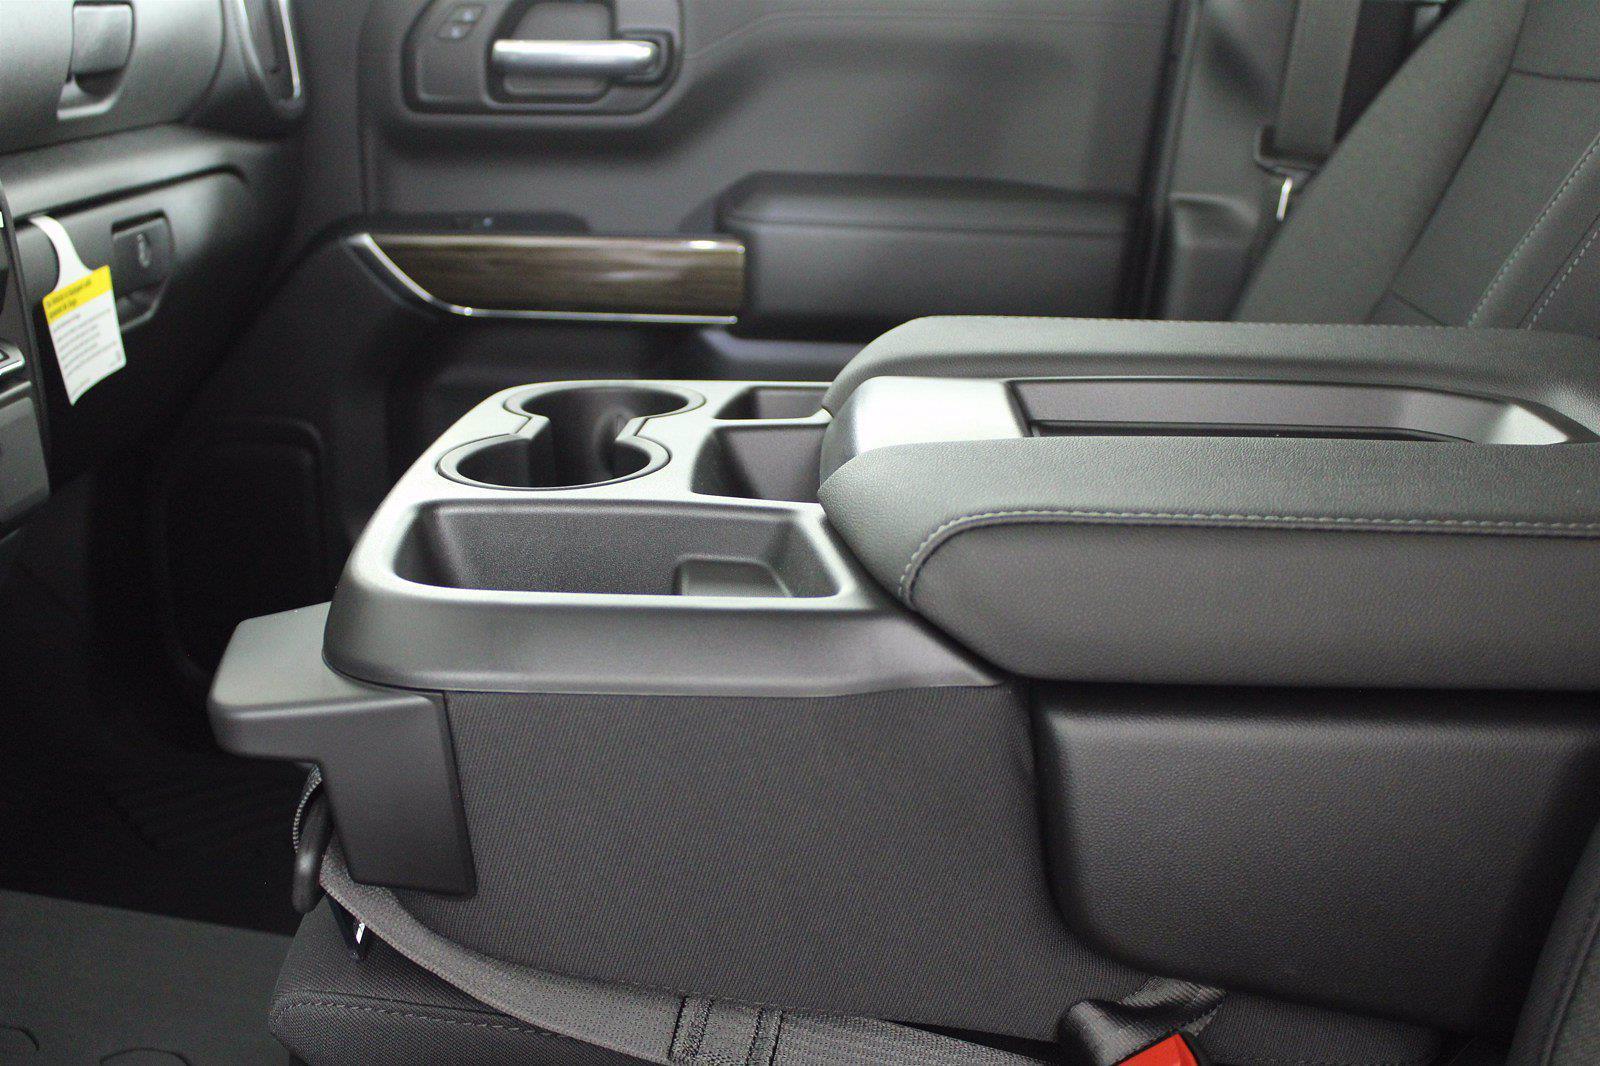 2021 Chevrolet Silverado 1500 Crew Cab 4x4, Pickup #D111142 - photo 13